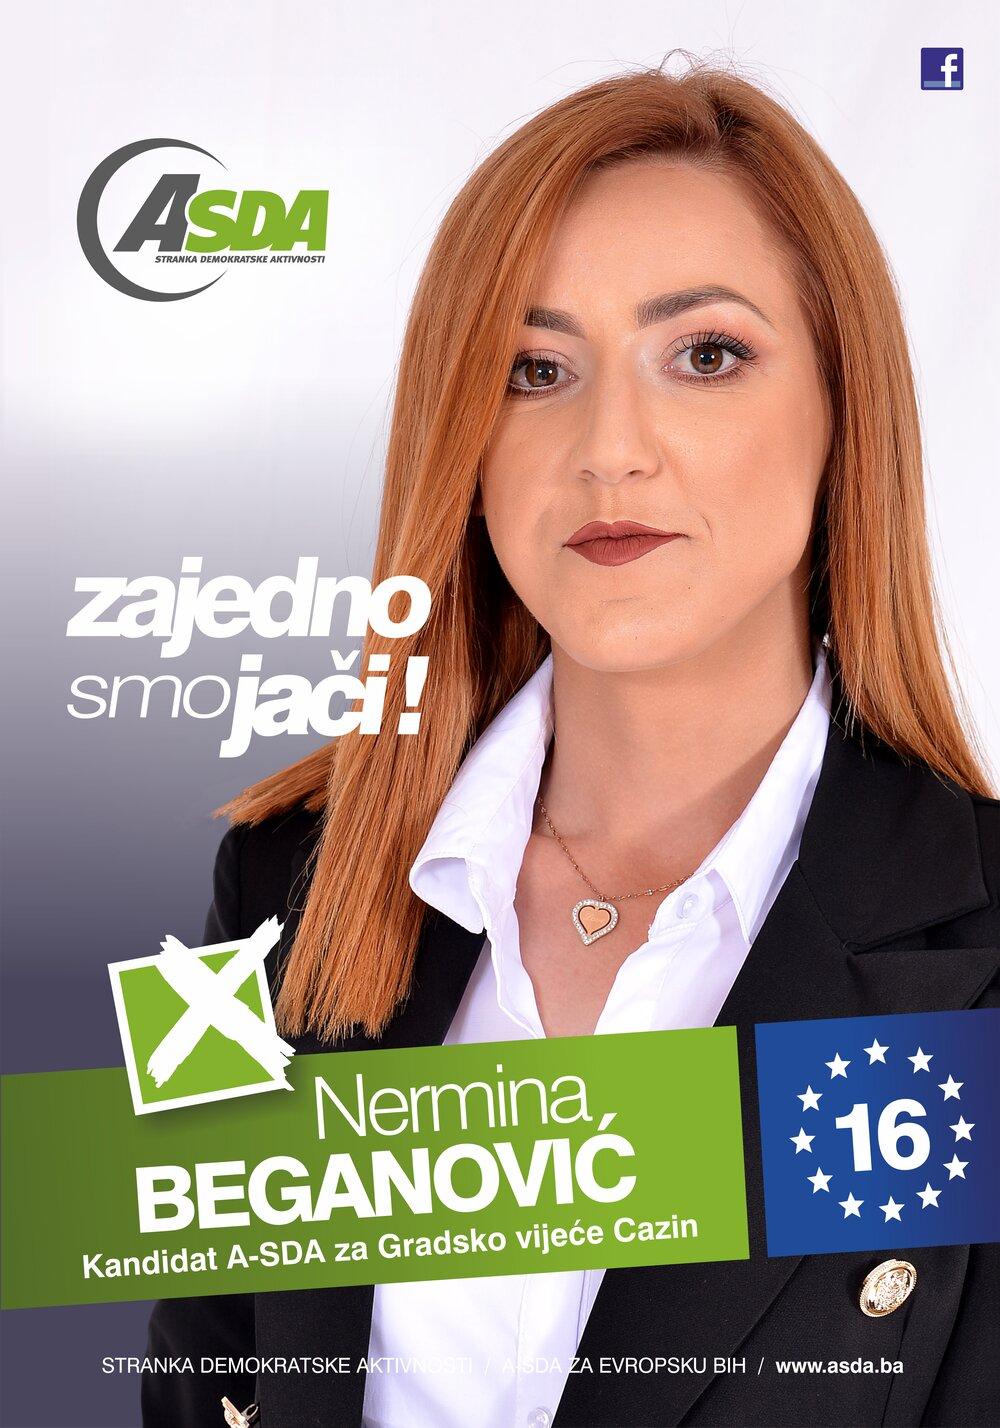 Nermina Beganović